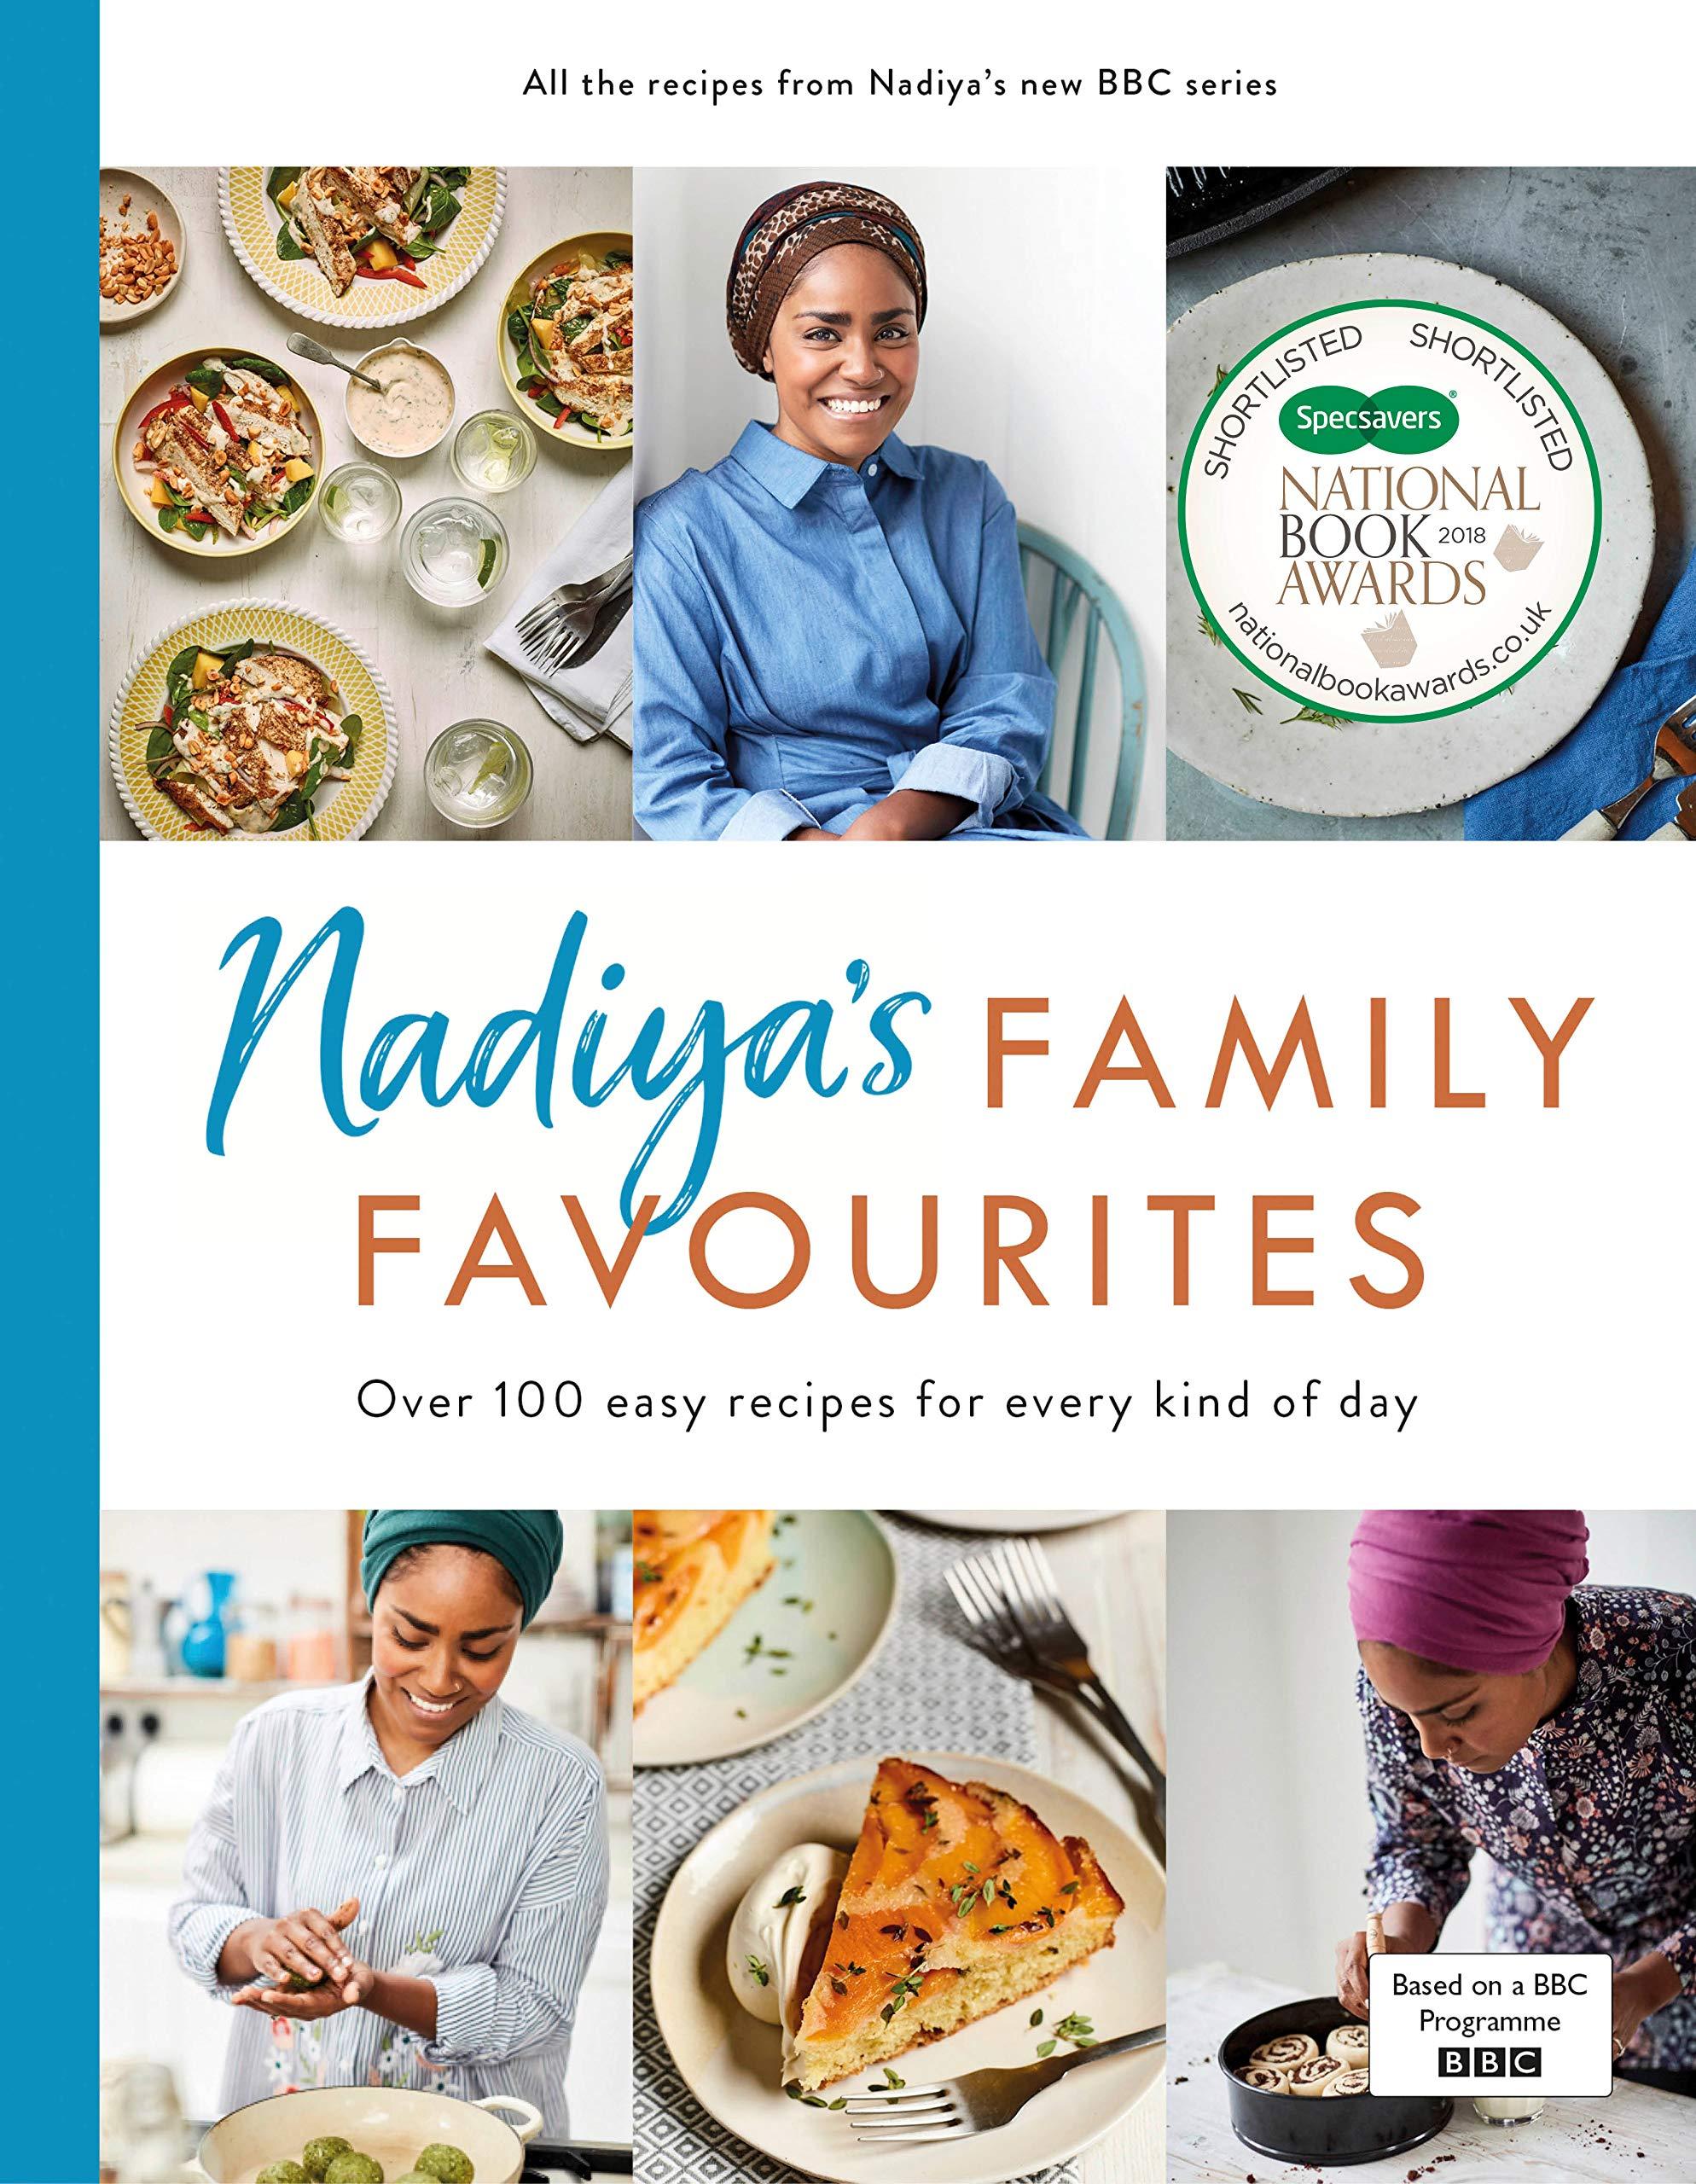 Nadiya's Family Favourites Hardback - £7 @ Amazon - Free Delivery with Prime / +£2.99 non Prime